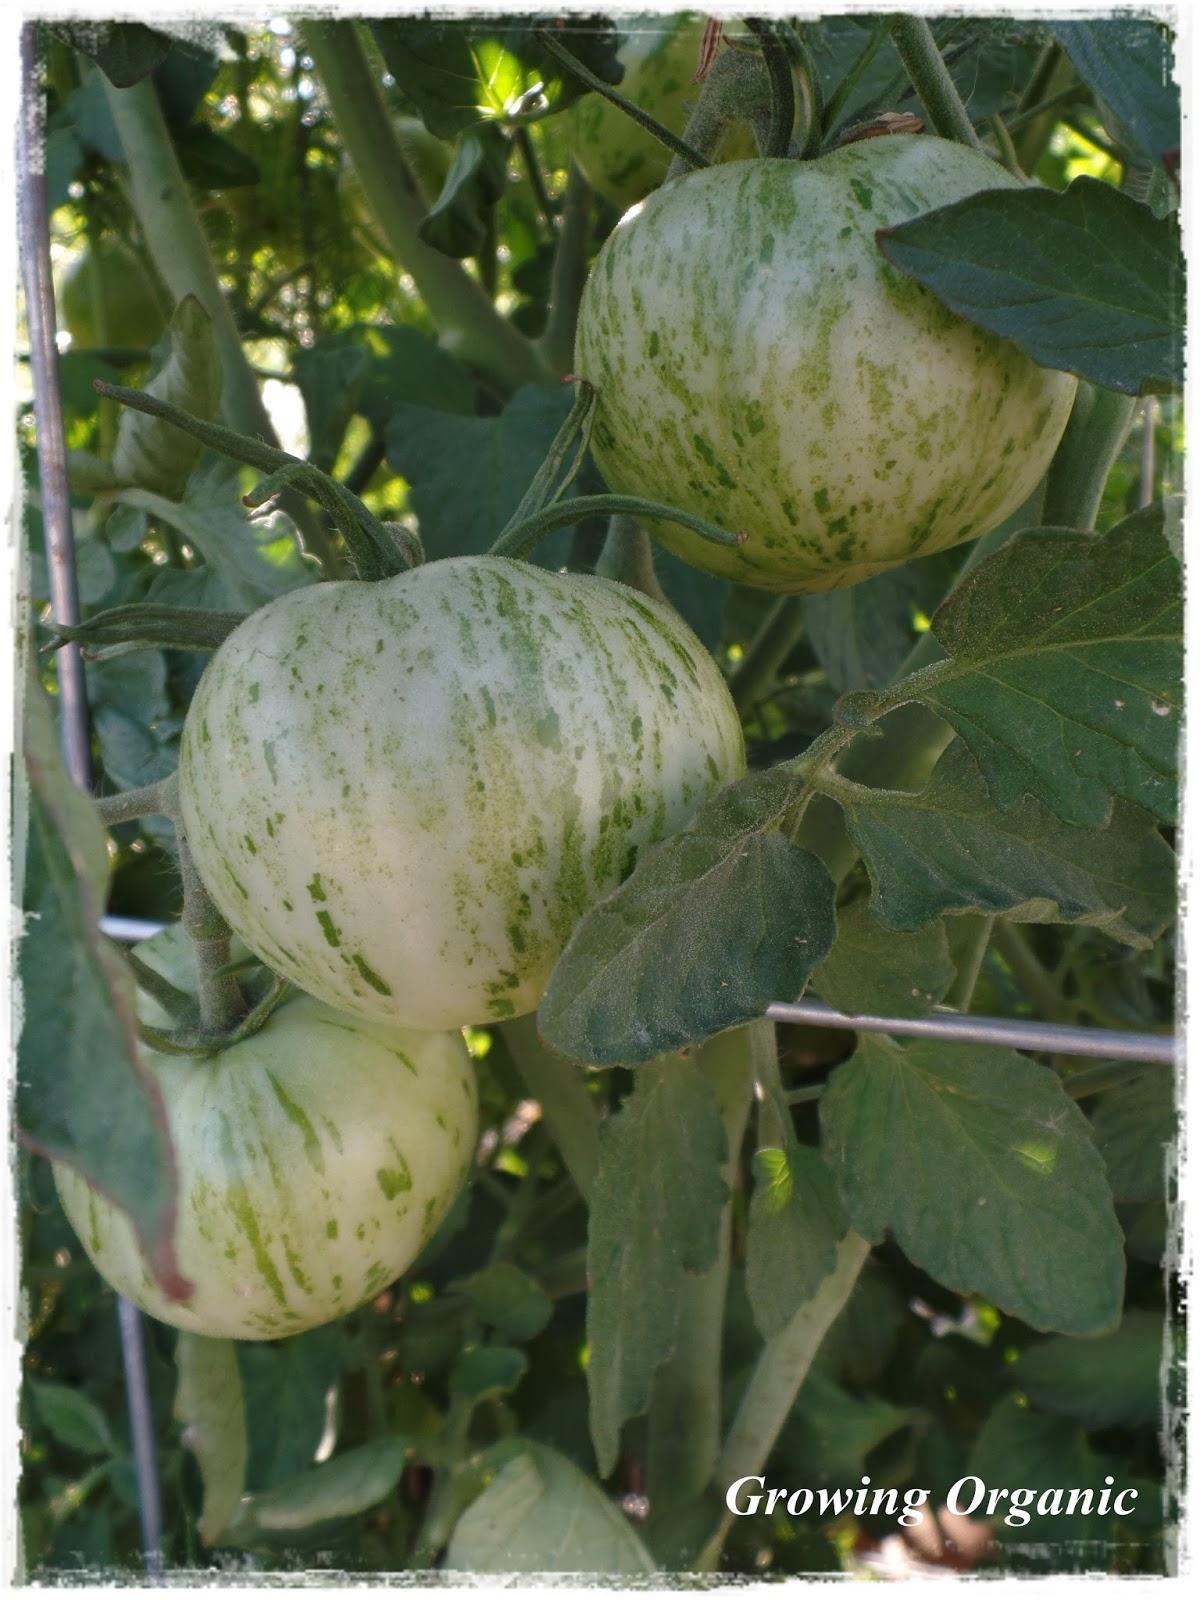 growing organic ripening green tomatoes indoors